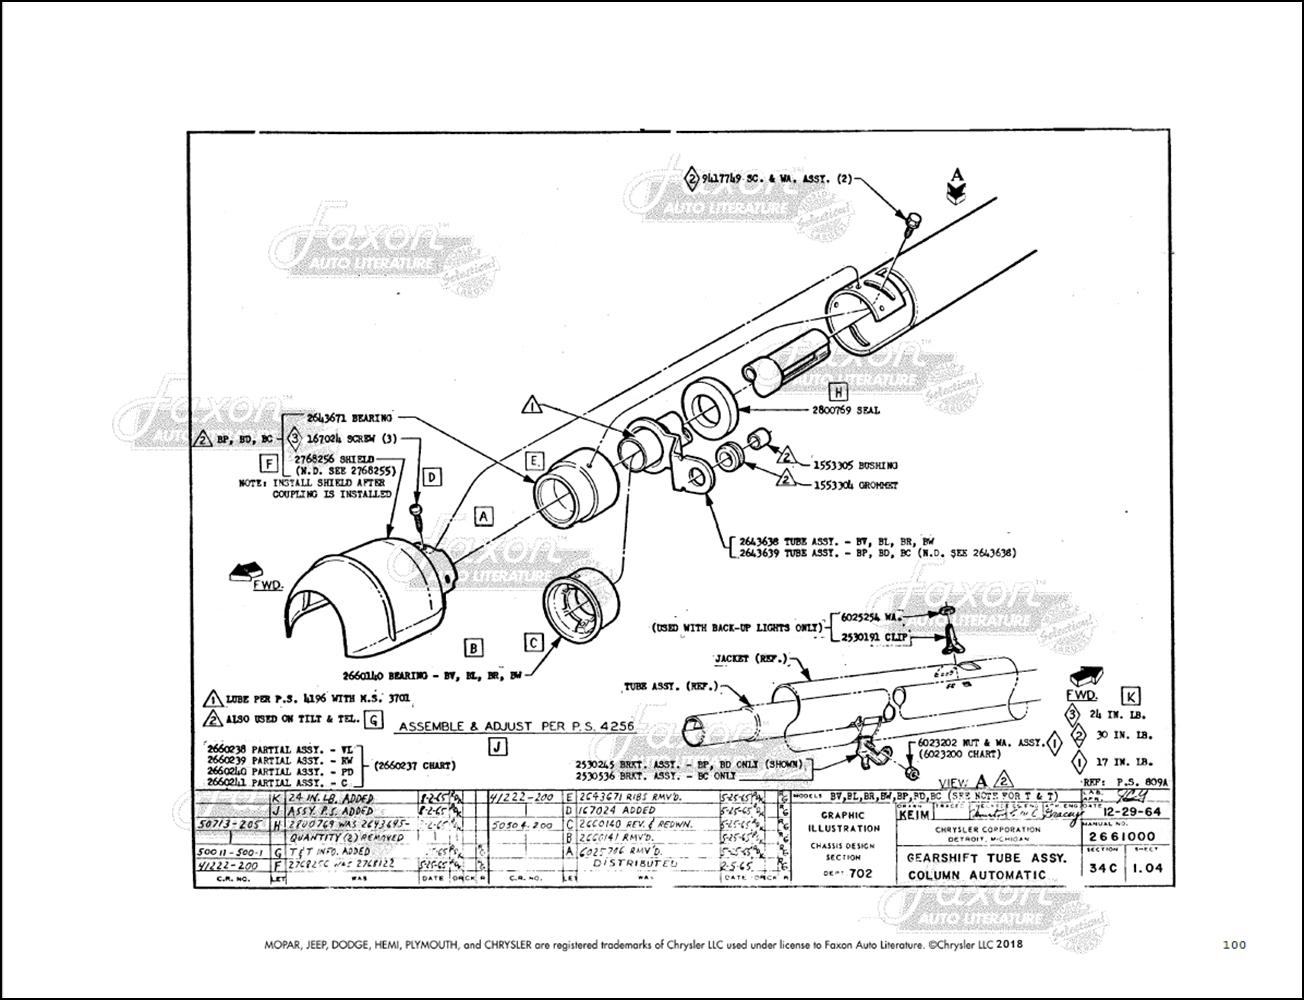 1966 Mopar C Chassis Assembly Manual Reprint Chrysler